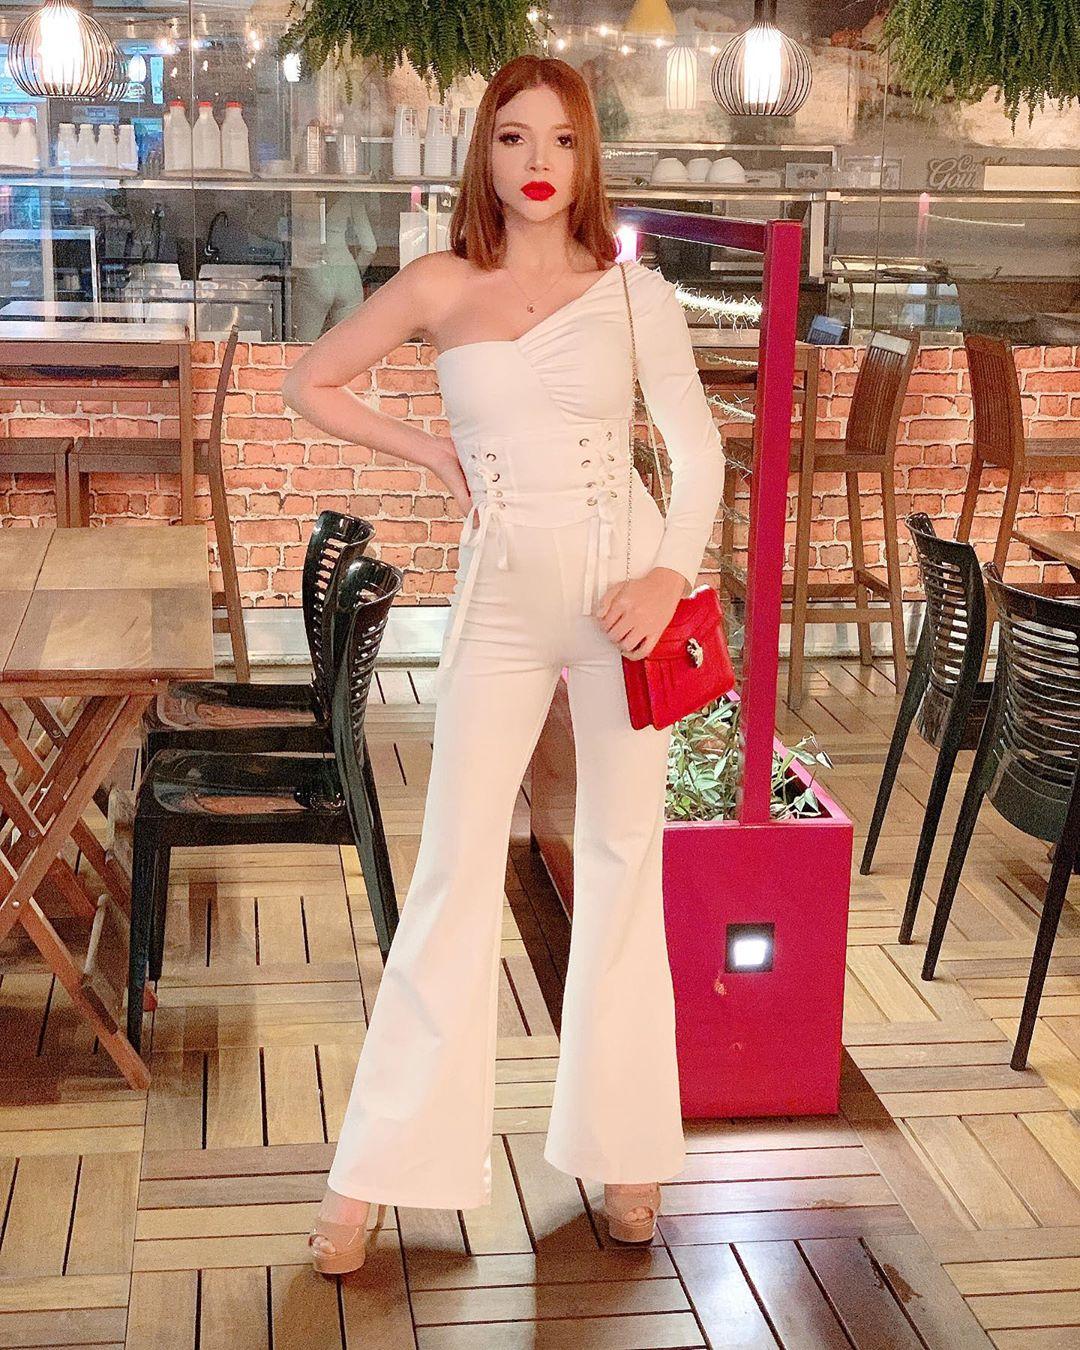 nathaly felix, top 20 de miss brasil mundo 2019. - Página 2 71912910